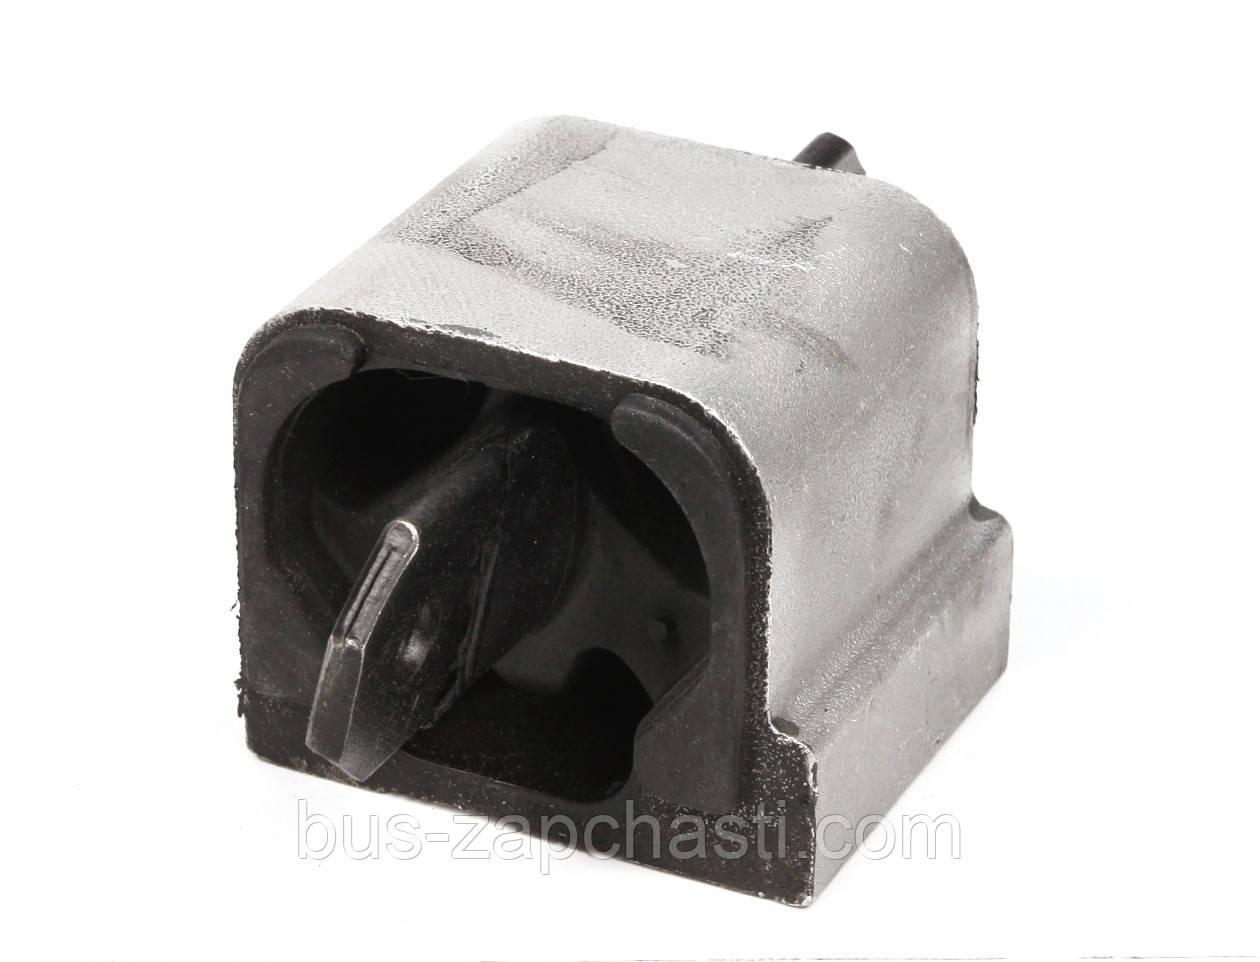 Подушка КПП MB Sprinter 906/ Vito 639/ VW Crafter 2006→ Autotechteile (Германия) — 100 2402